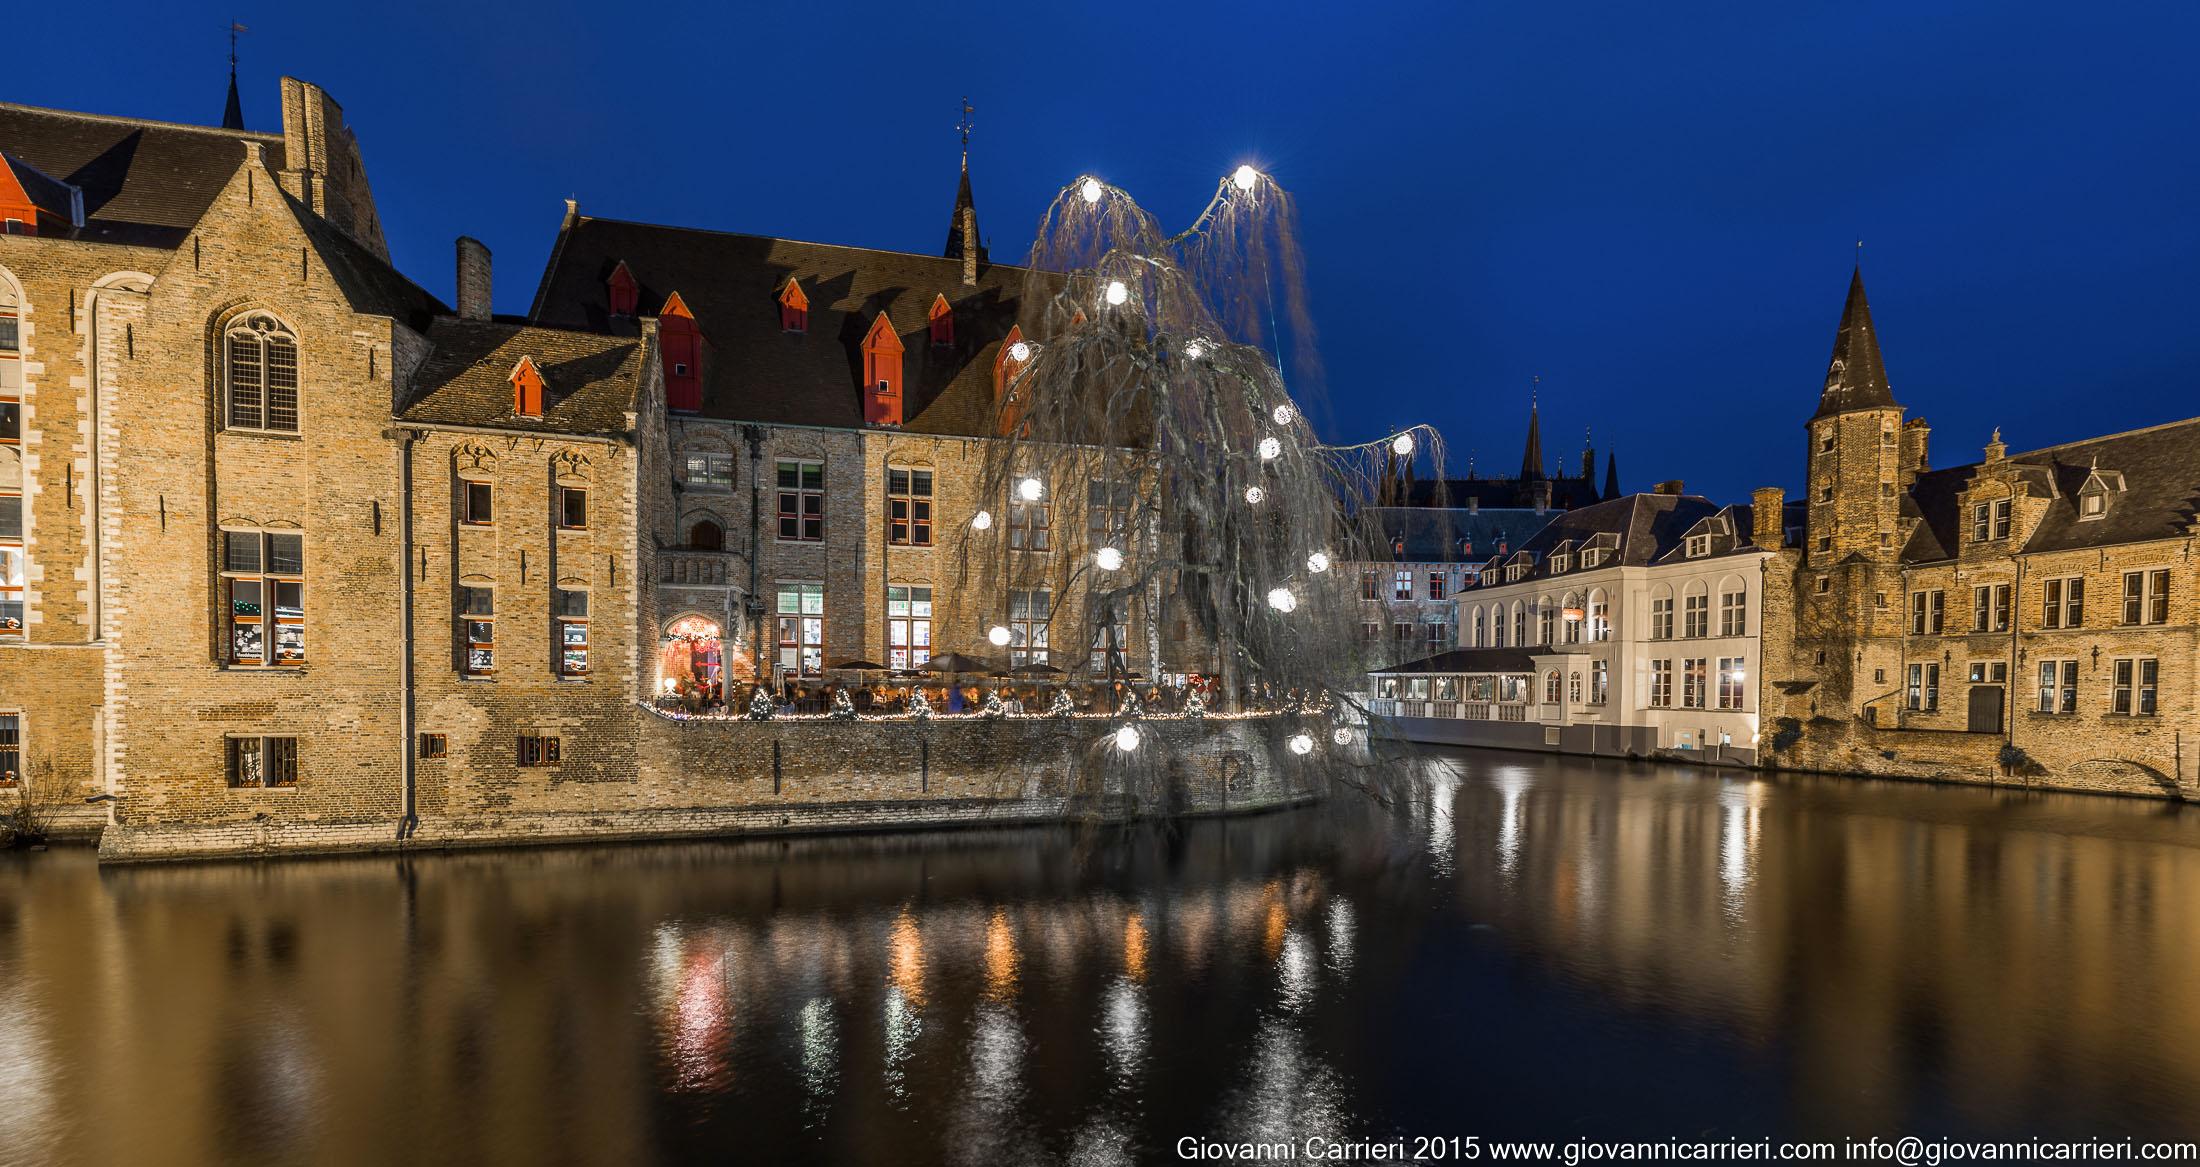 Vista notturna del canale Rozenhoedkaai, Bruges